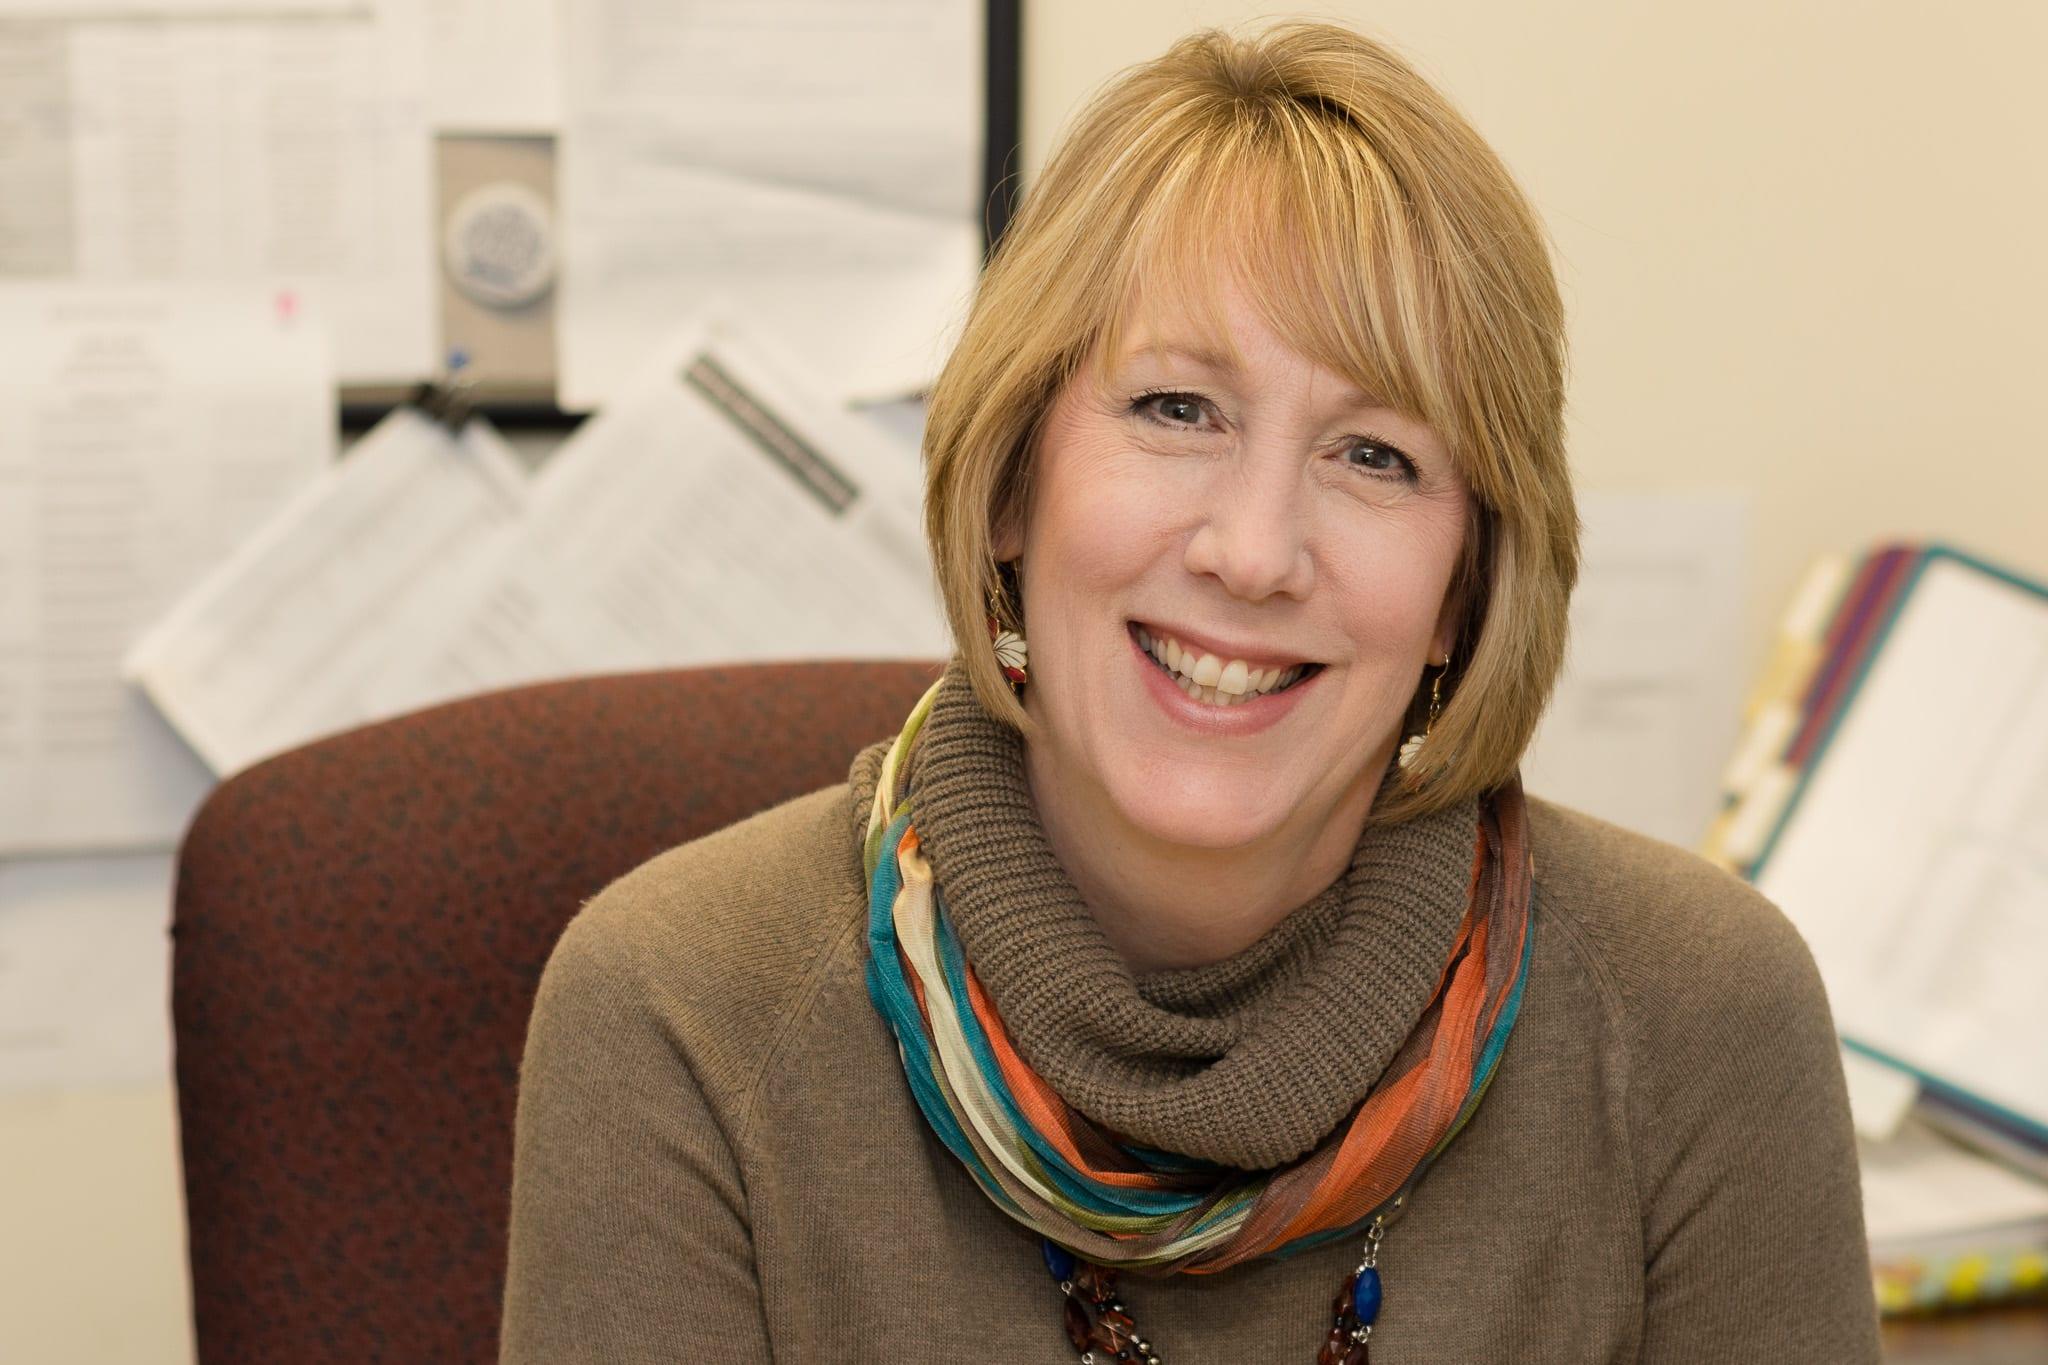 photo of Cyndi Herron in her office.